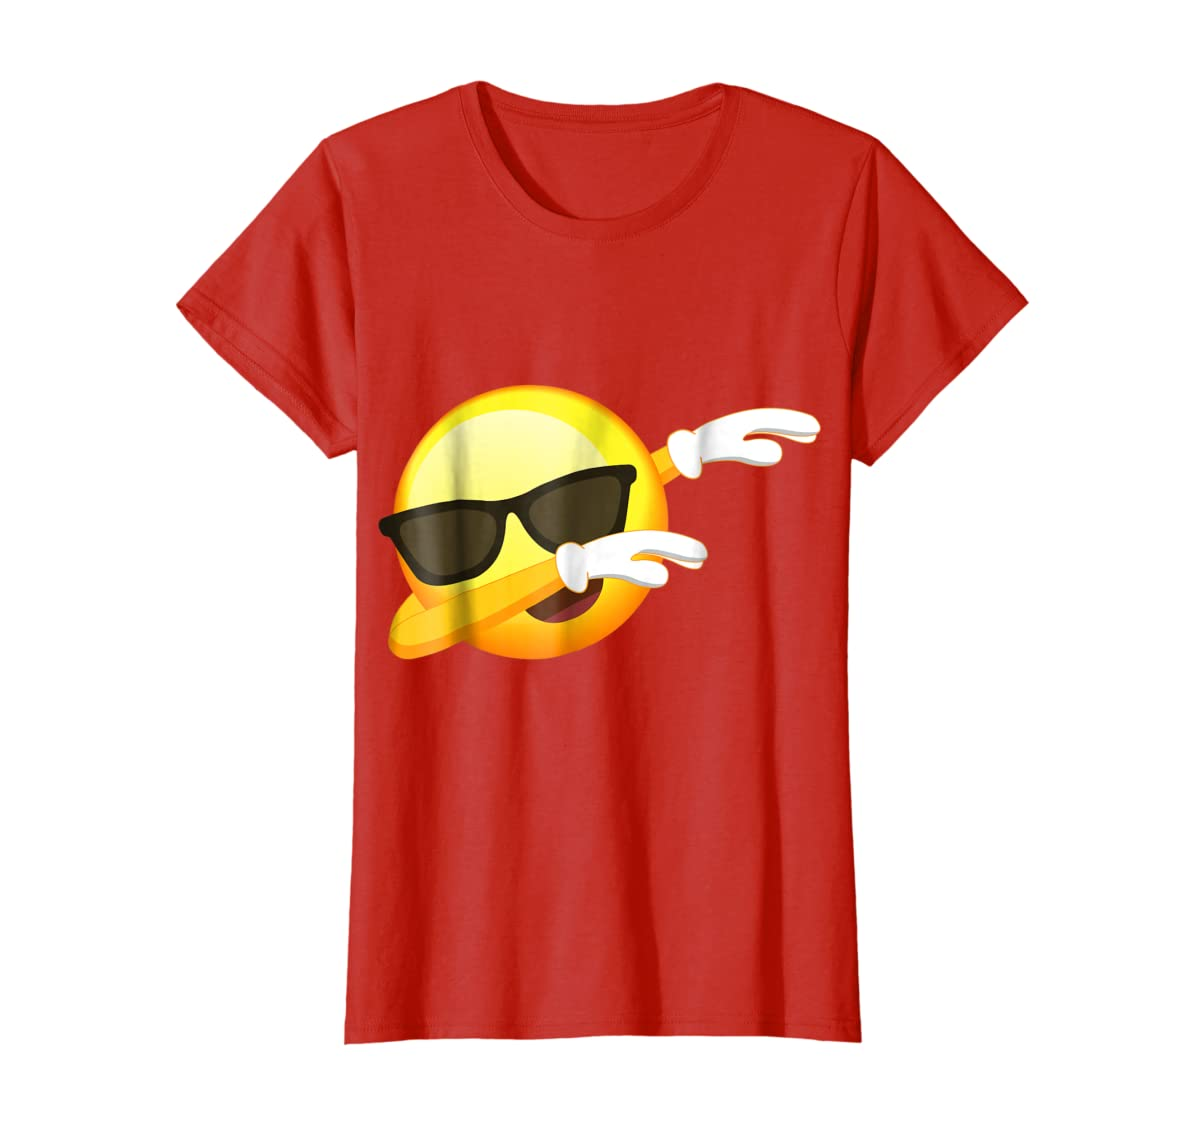 Funny Dabbing Emoji Shirt - Cool Emoji Dab T-Shirt-Women's T-Shirt-Red